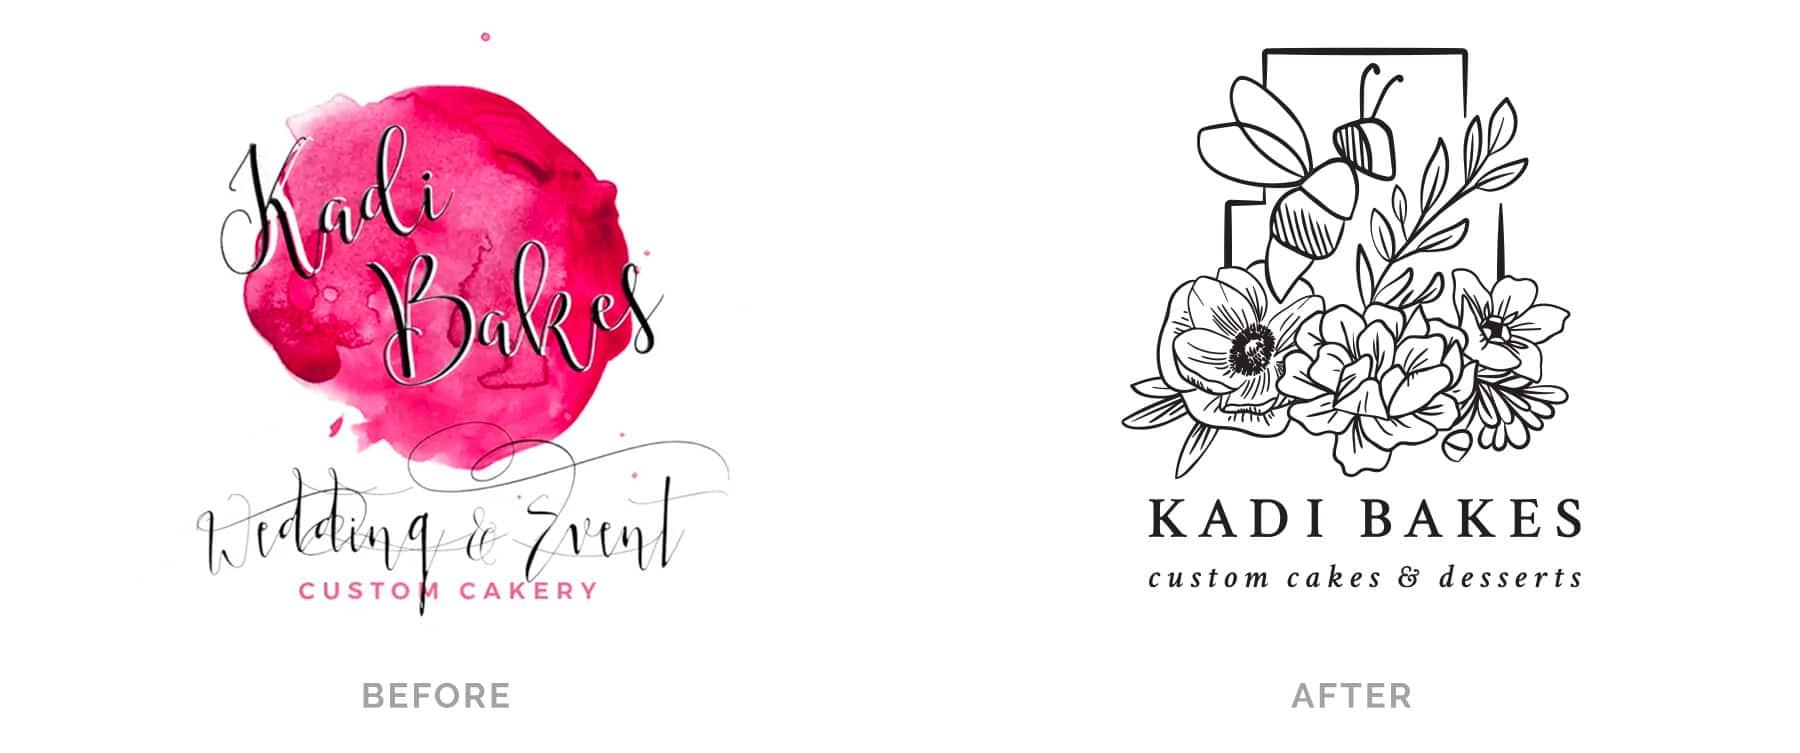 Before and After Kadi Bakes